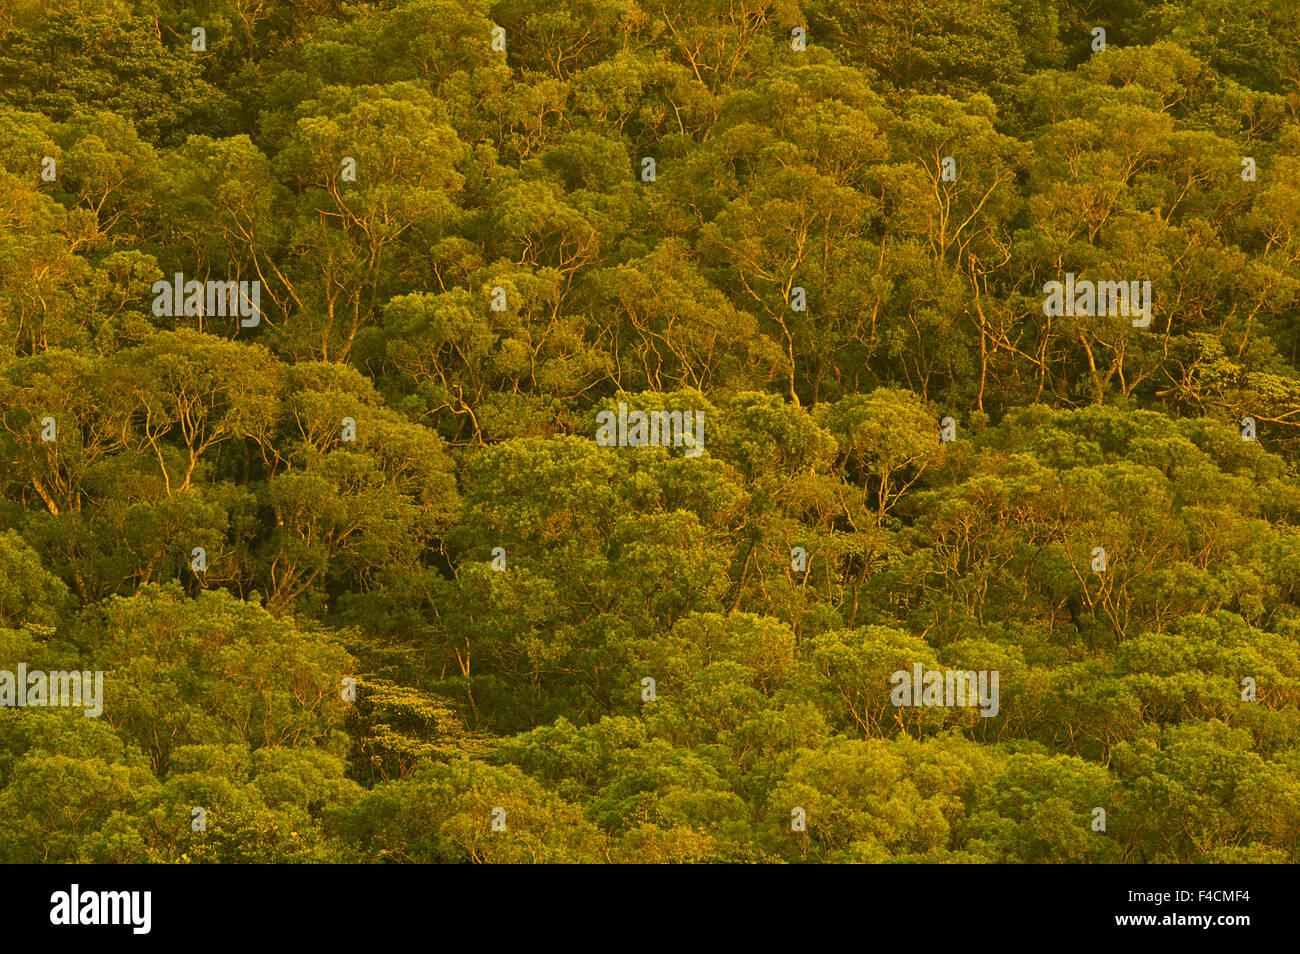 Hong Kong, Po Lin Monastery. Lantau Island. (Large format sizes available) - Stock Image